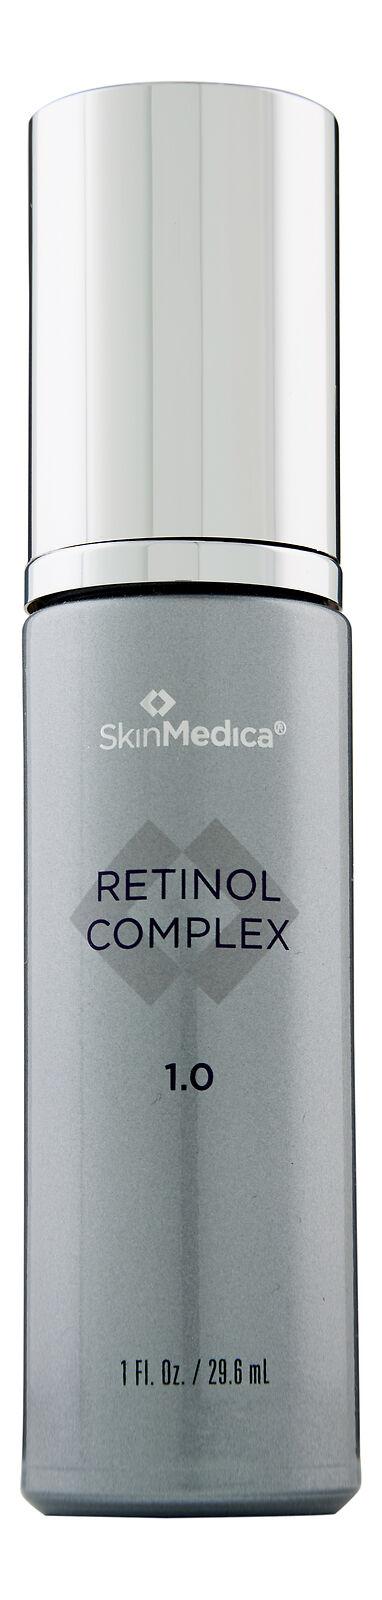 SkinMedica Retinol Complex 1.0 1 oz. Skin Treatment 2